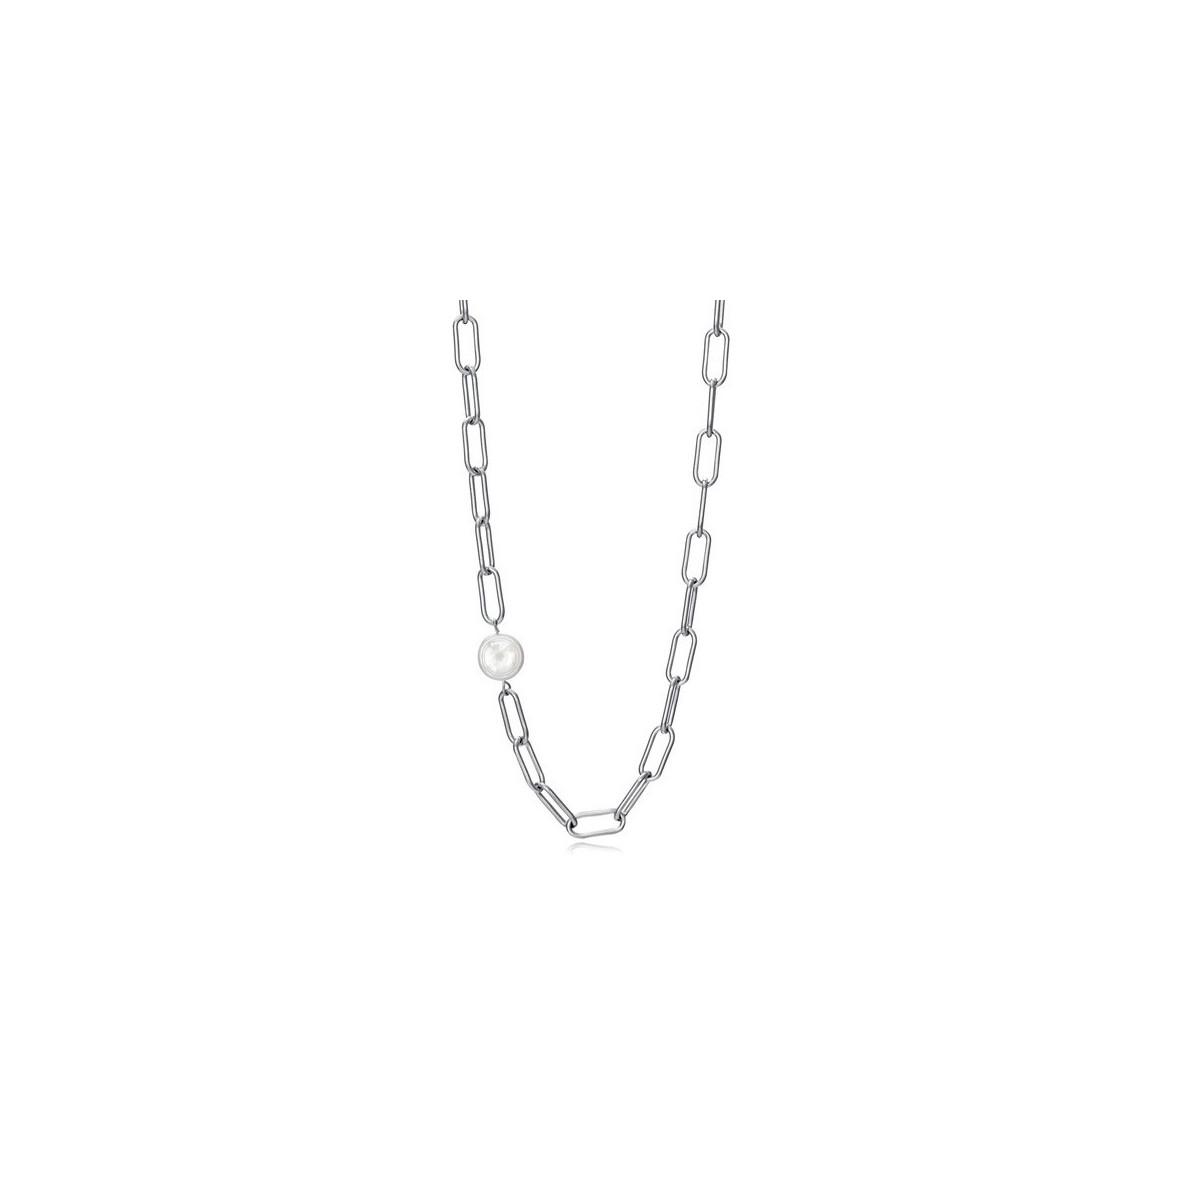 Collar Viceroy Chic 1317C01000